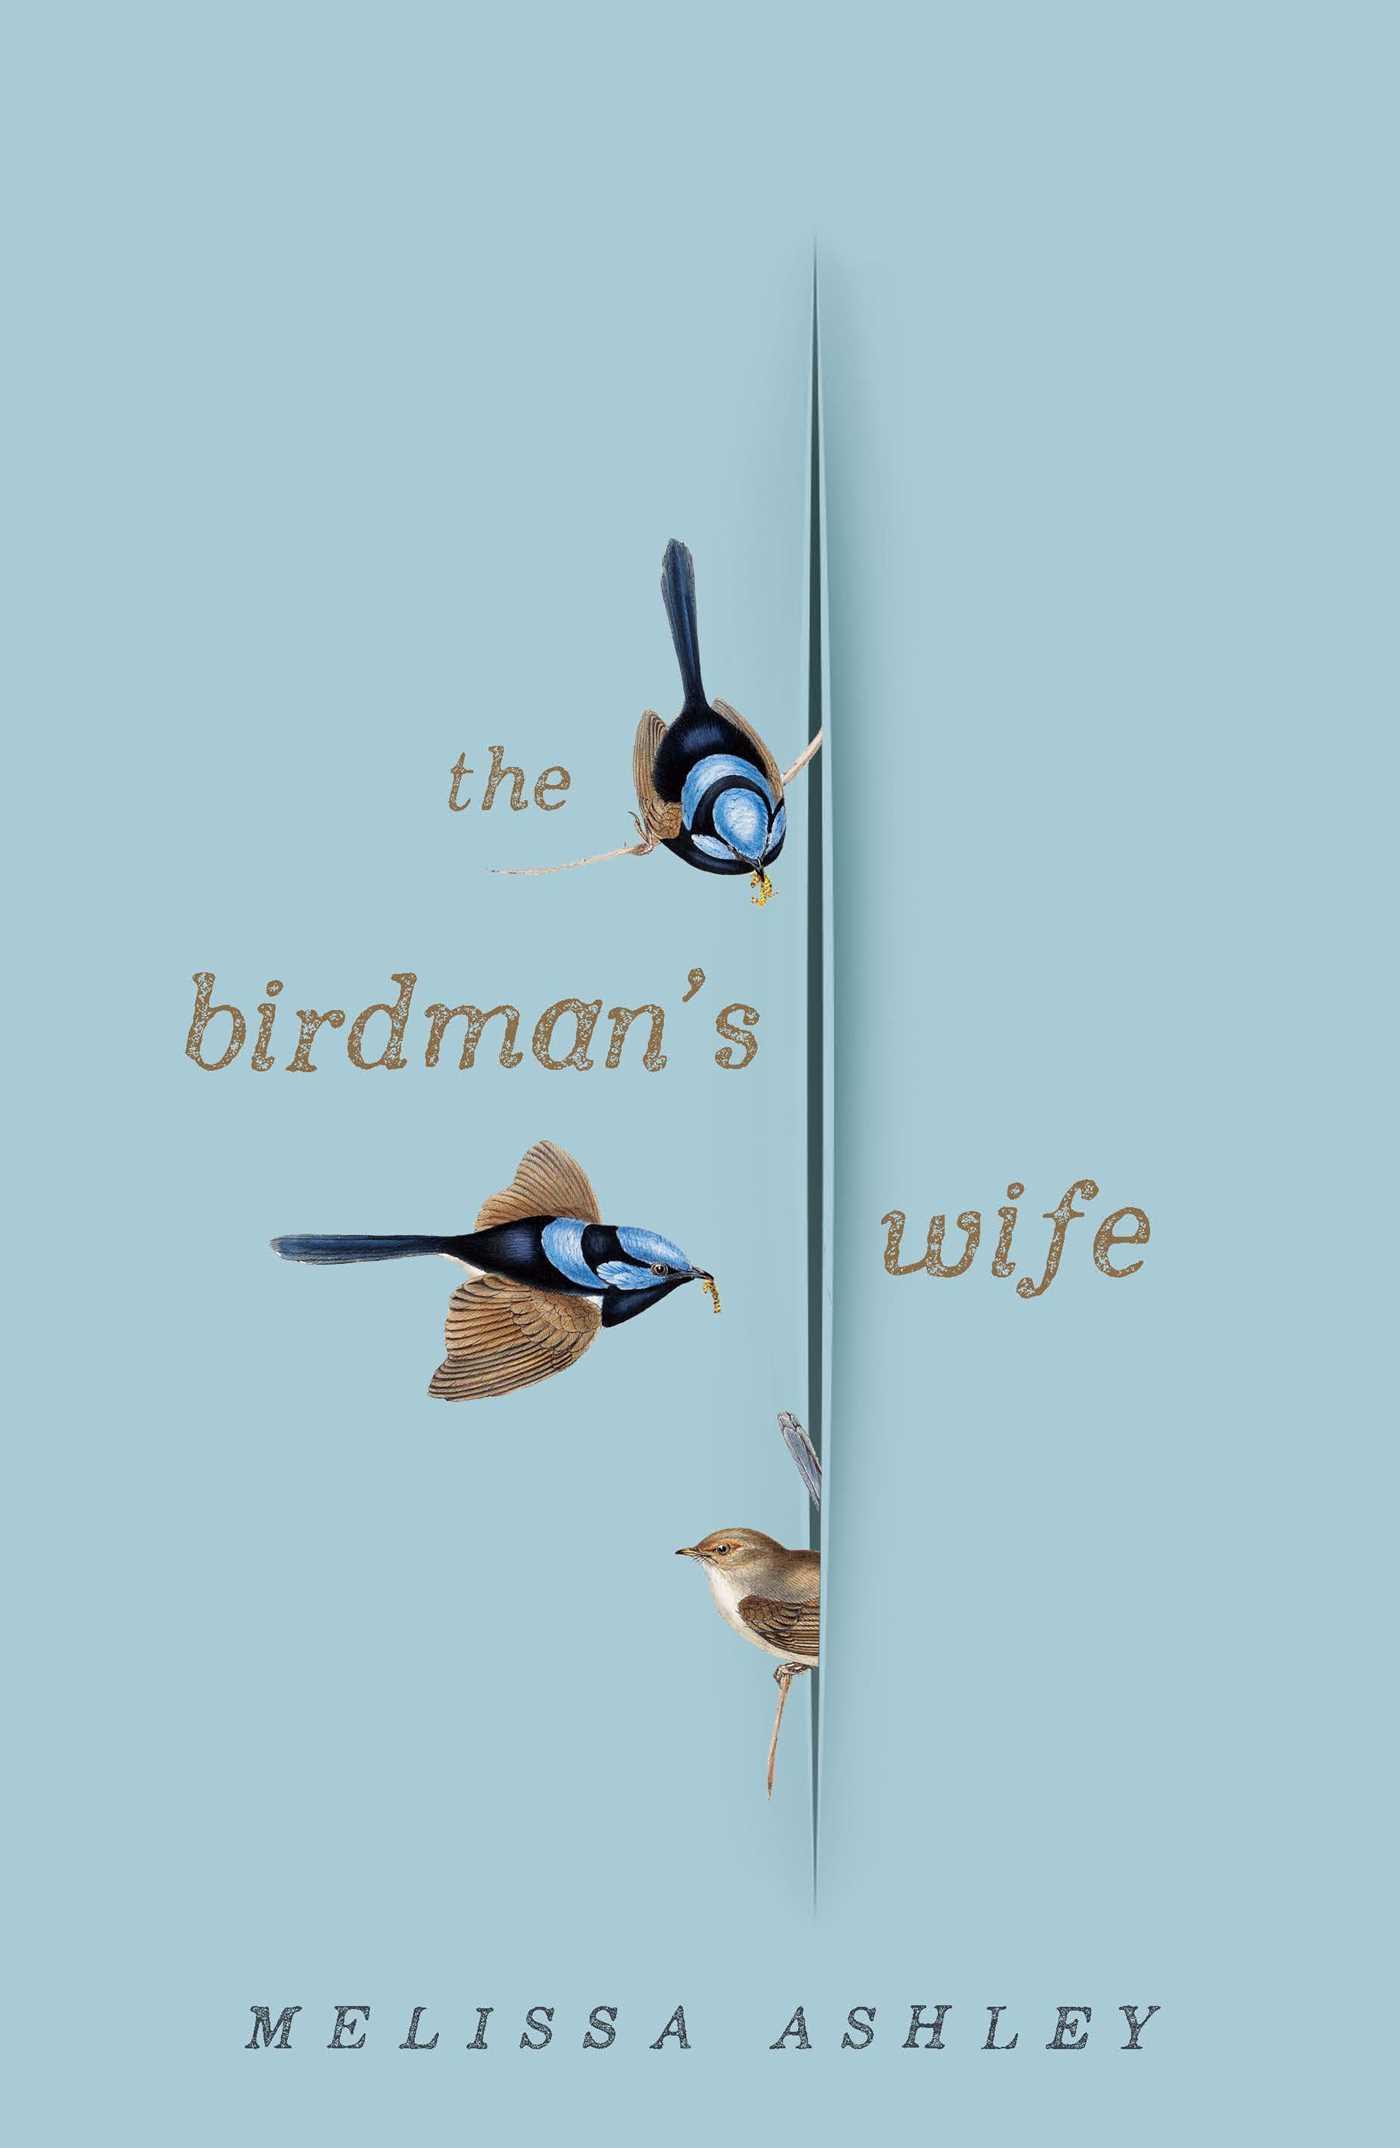 The Birdman's Wifeby Melissa Ashley